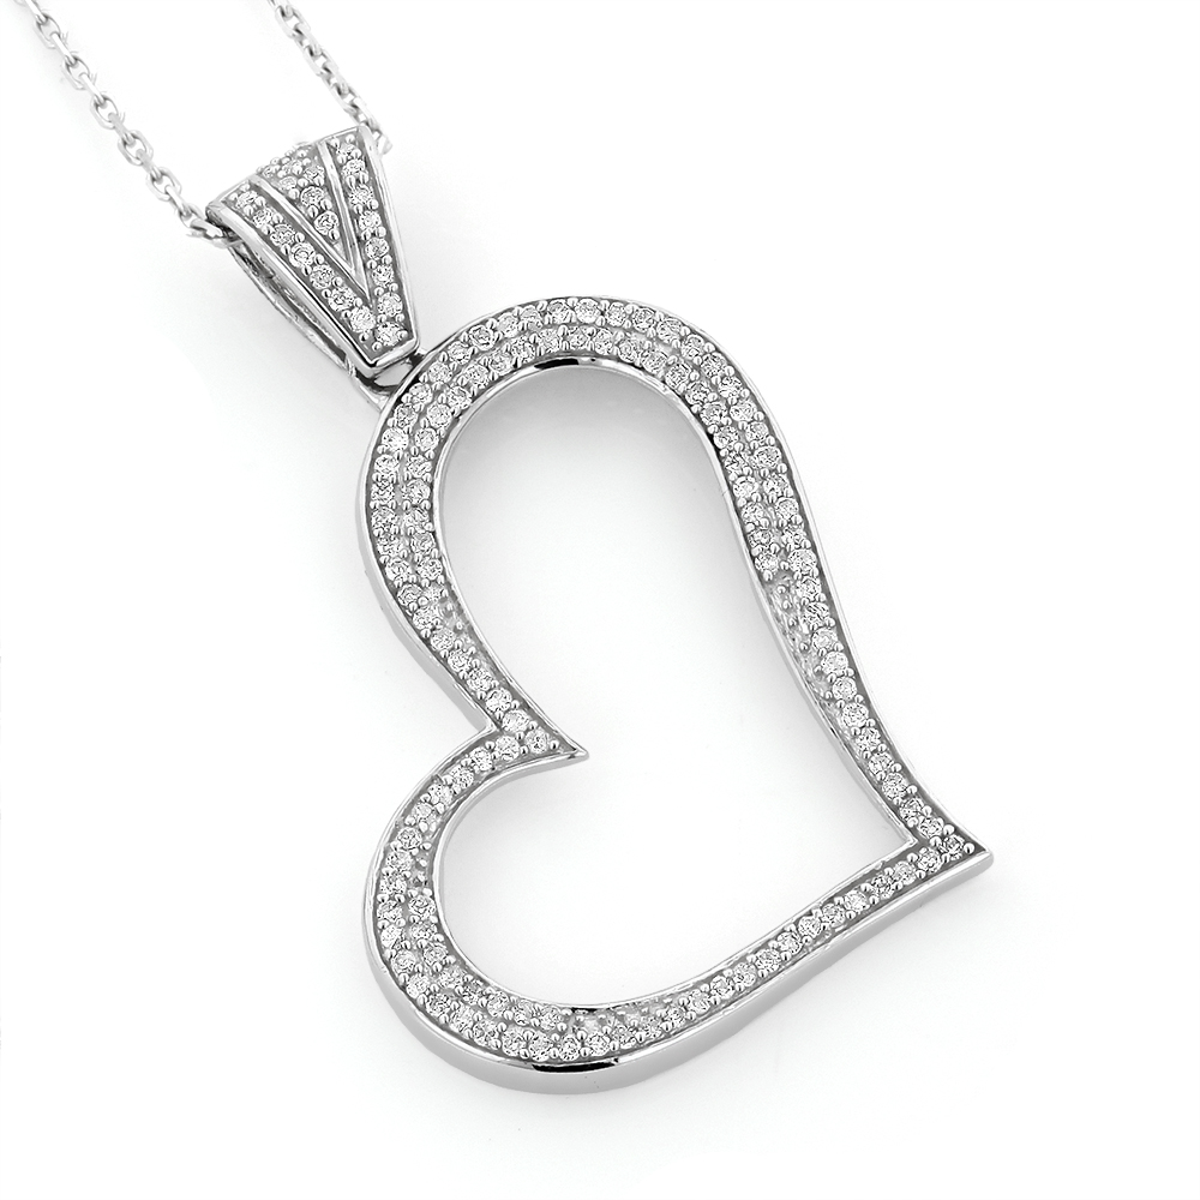 14K Gold Round Pave Diamond Heart Pendant 0.5ct